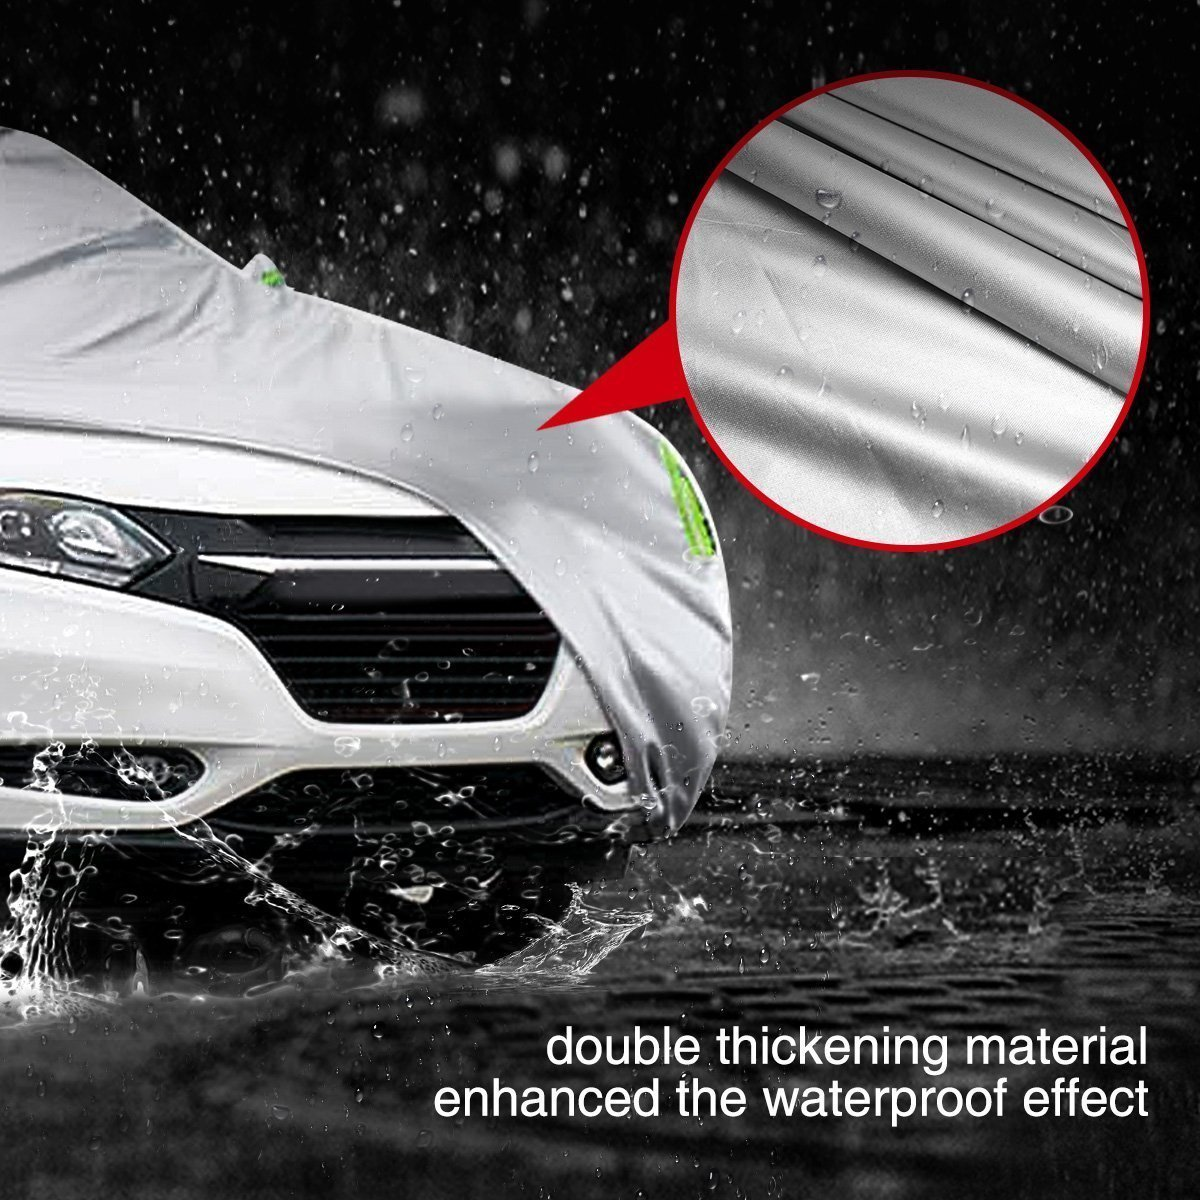 Frost Car Windshield Snow Cover Manba Sun Shade Protector Lypumso Car Windshield Snow Cover Silver